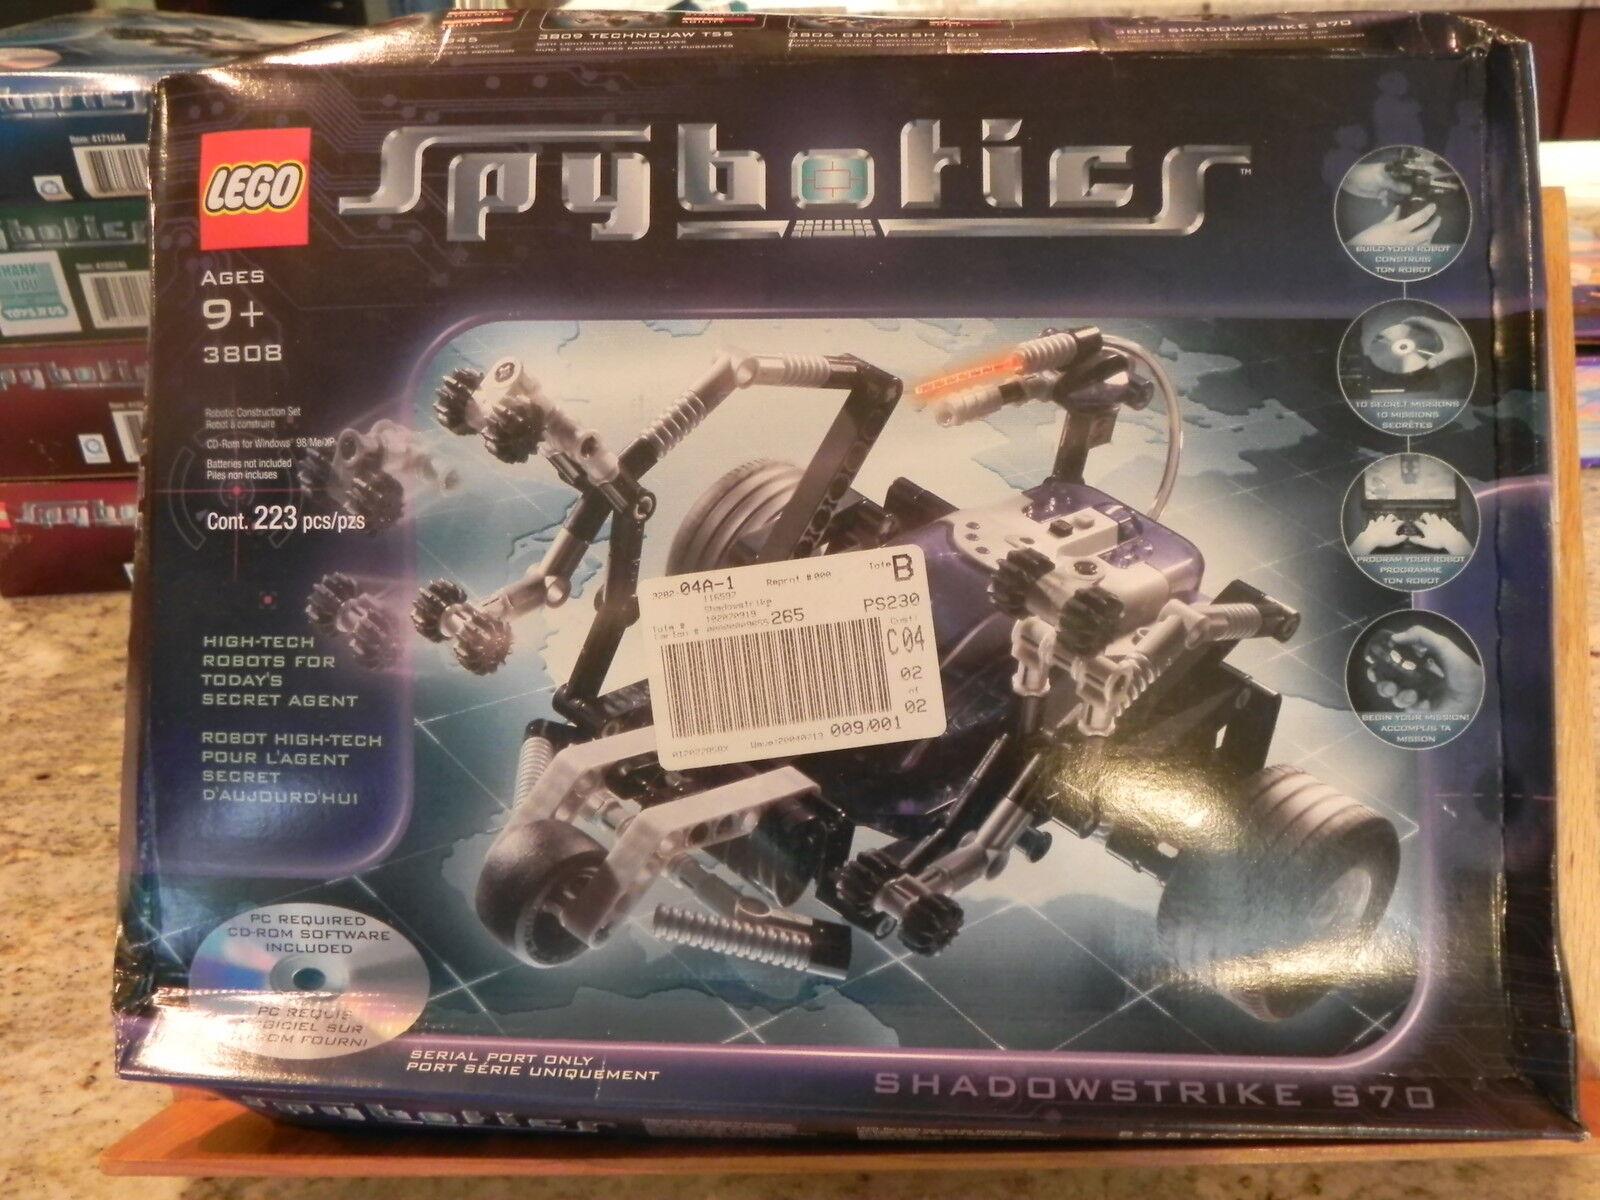 Lego Spybotics Spybotics Spybotics Shadowstrike S70 (3808), Rare New in Sealed Box b09dc3